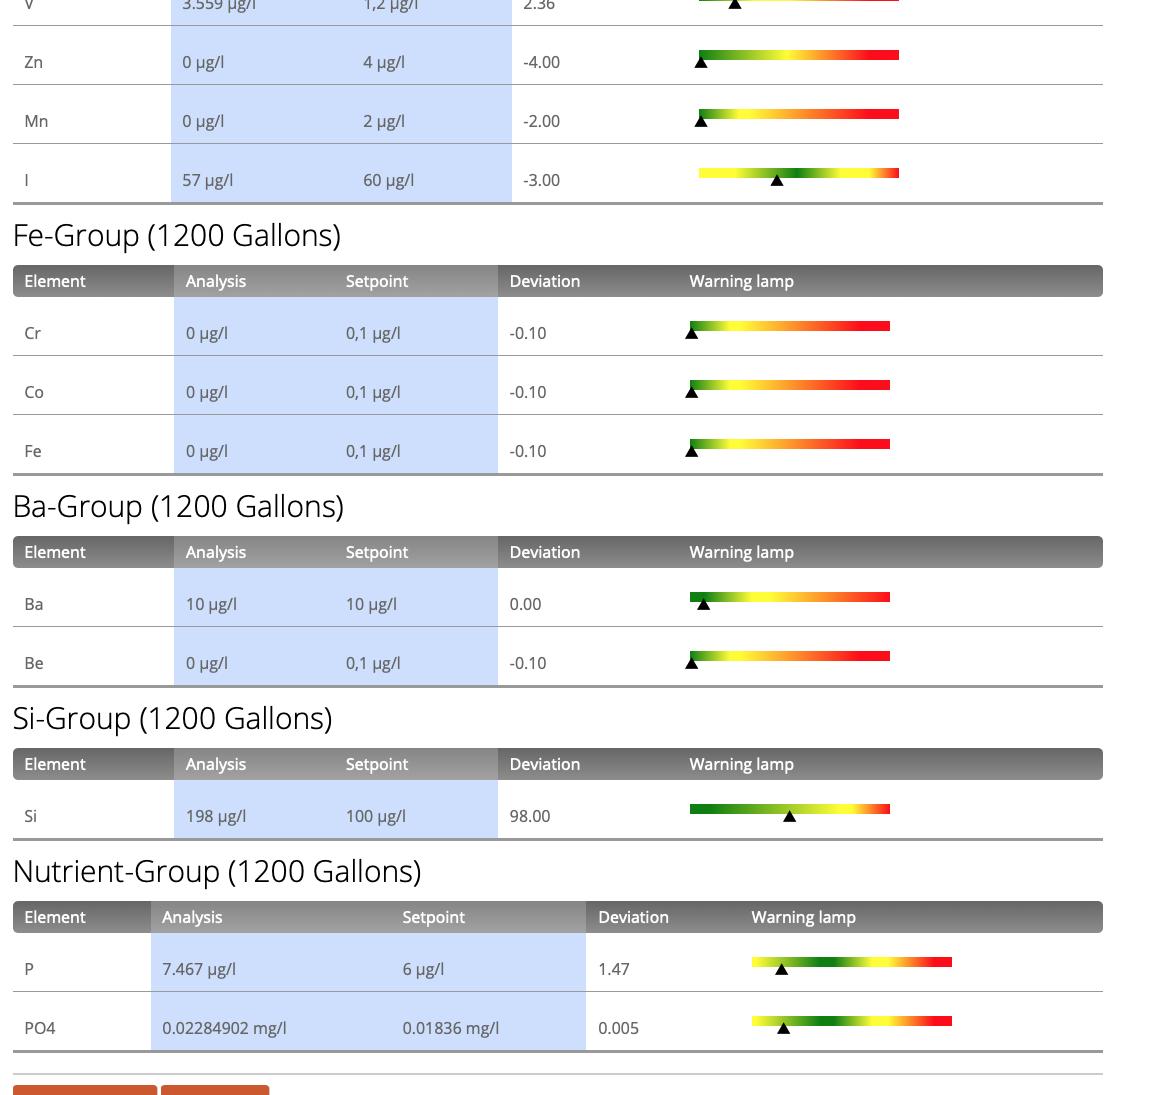 Screenshot 2020-01-11 13.35.41.png